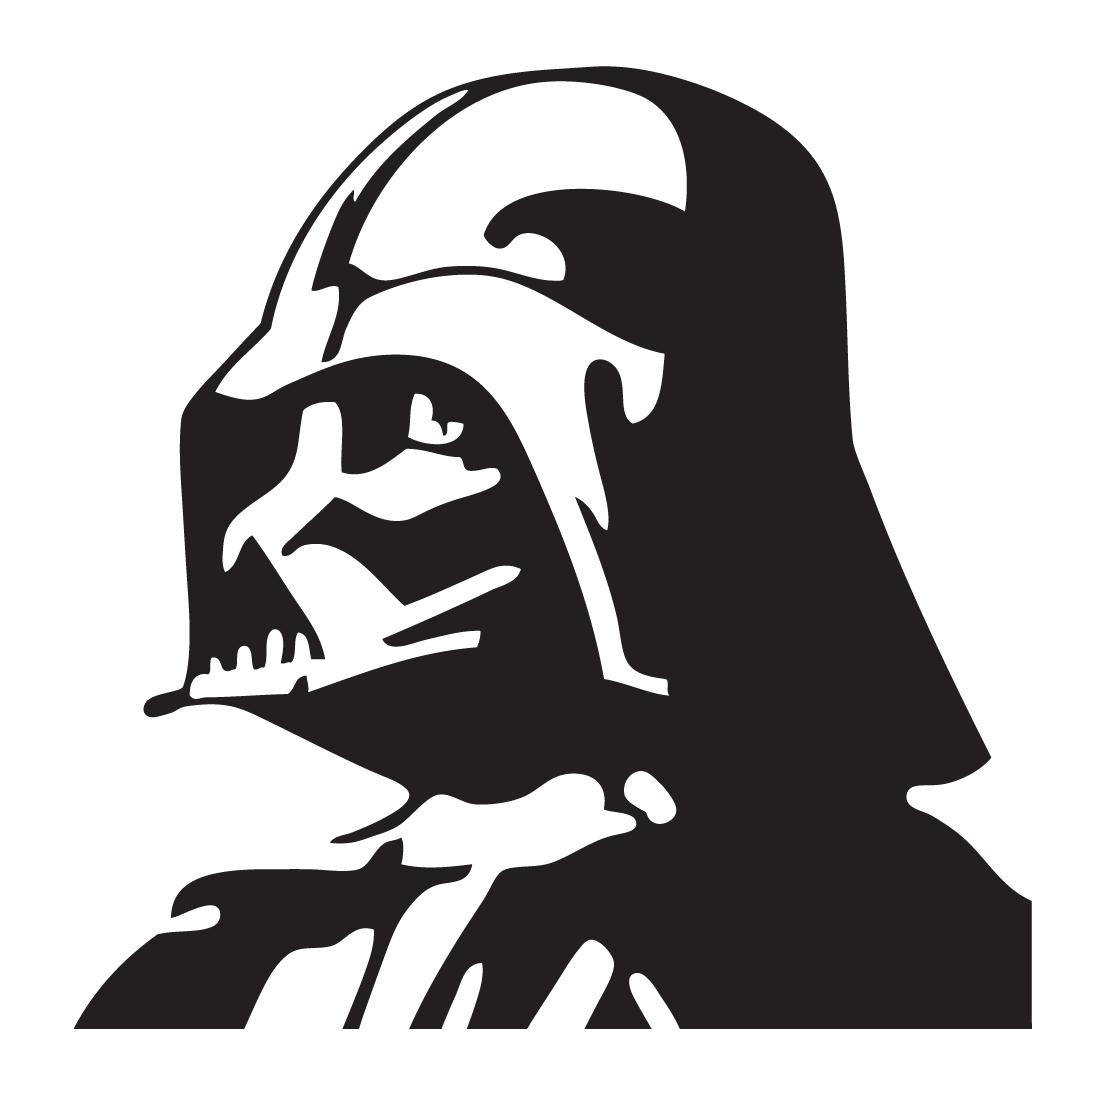 Adhesivo De Vinilo Darth Vader Star Wars Vinilos Darth